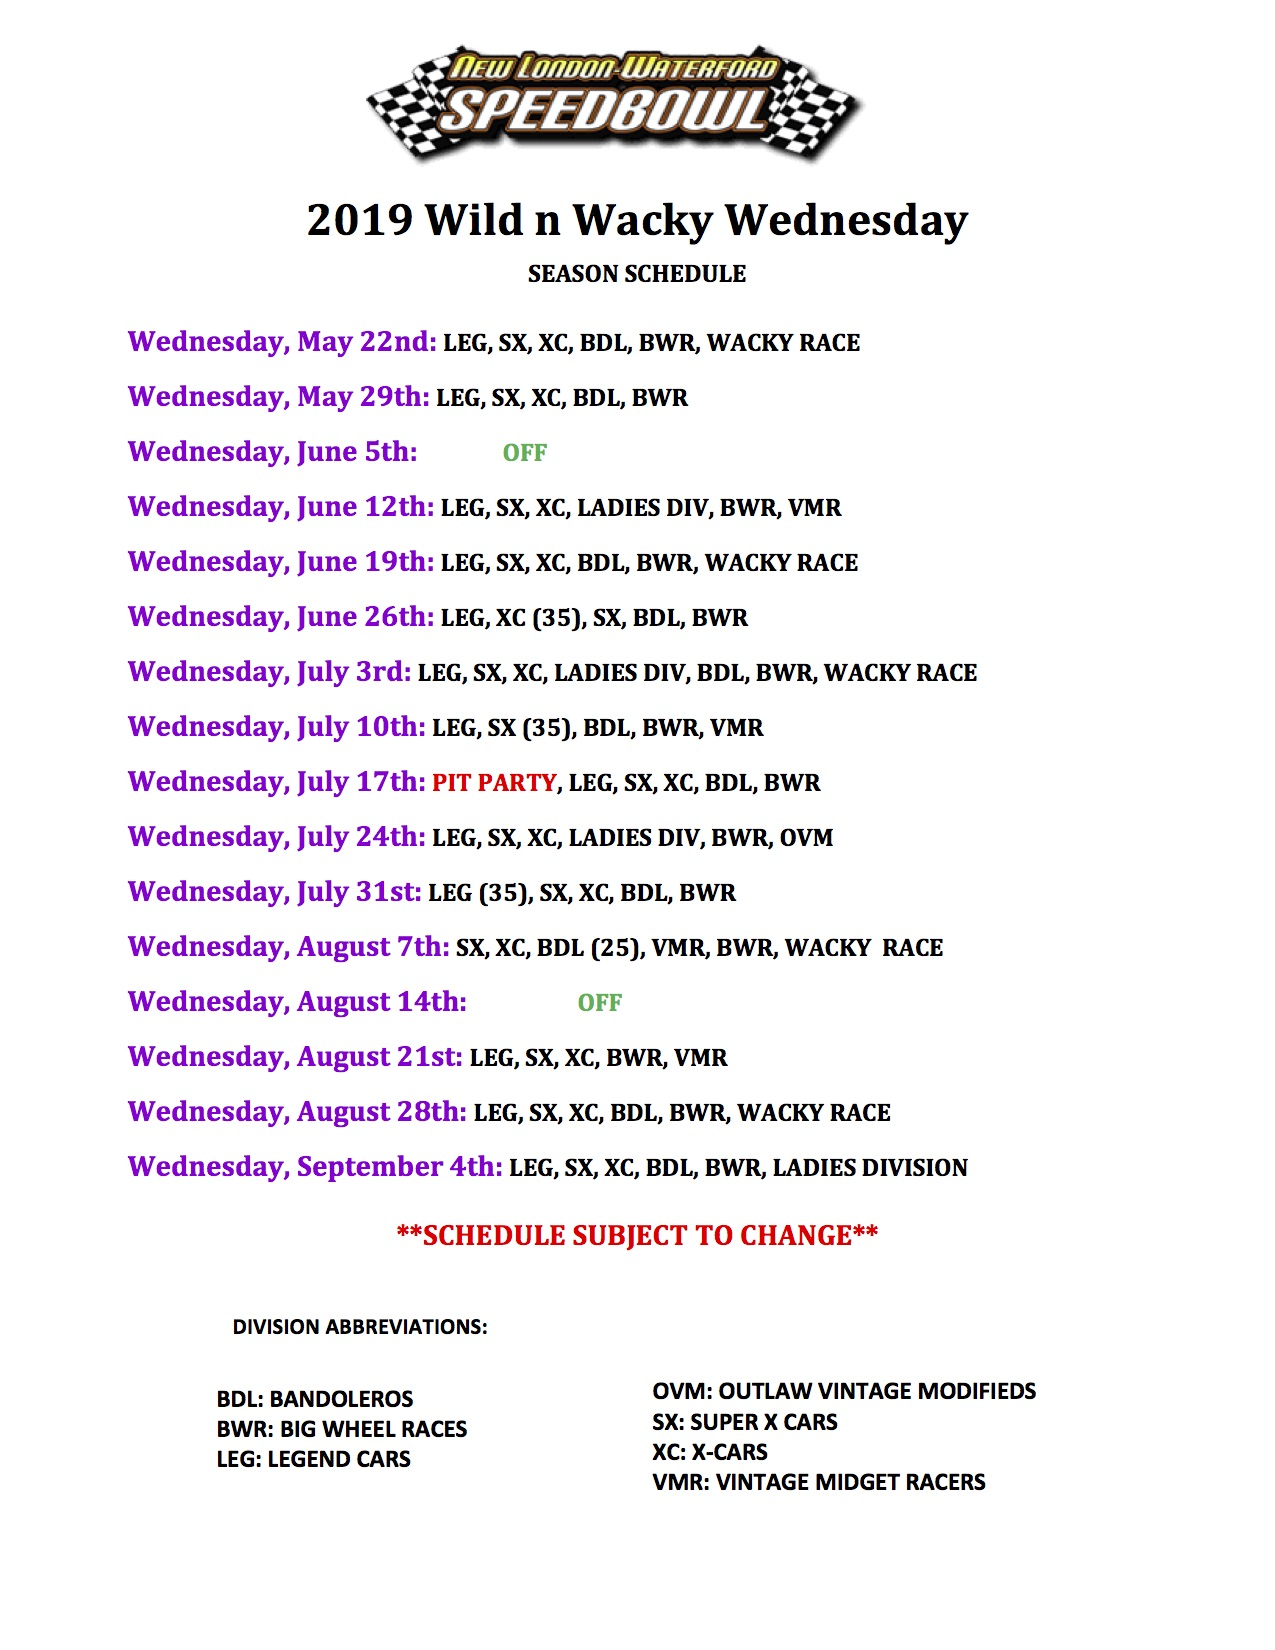 2019 Wild & Wacky Wednesday Season Schedule